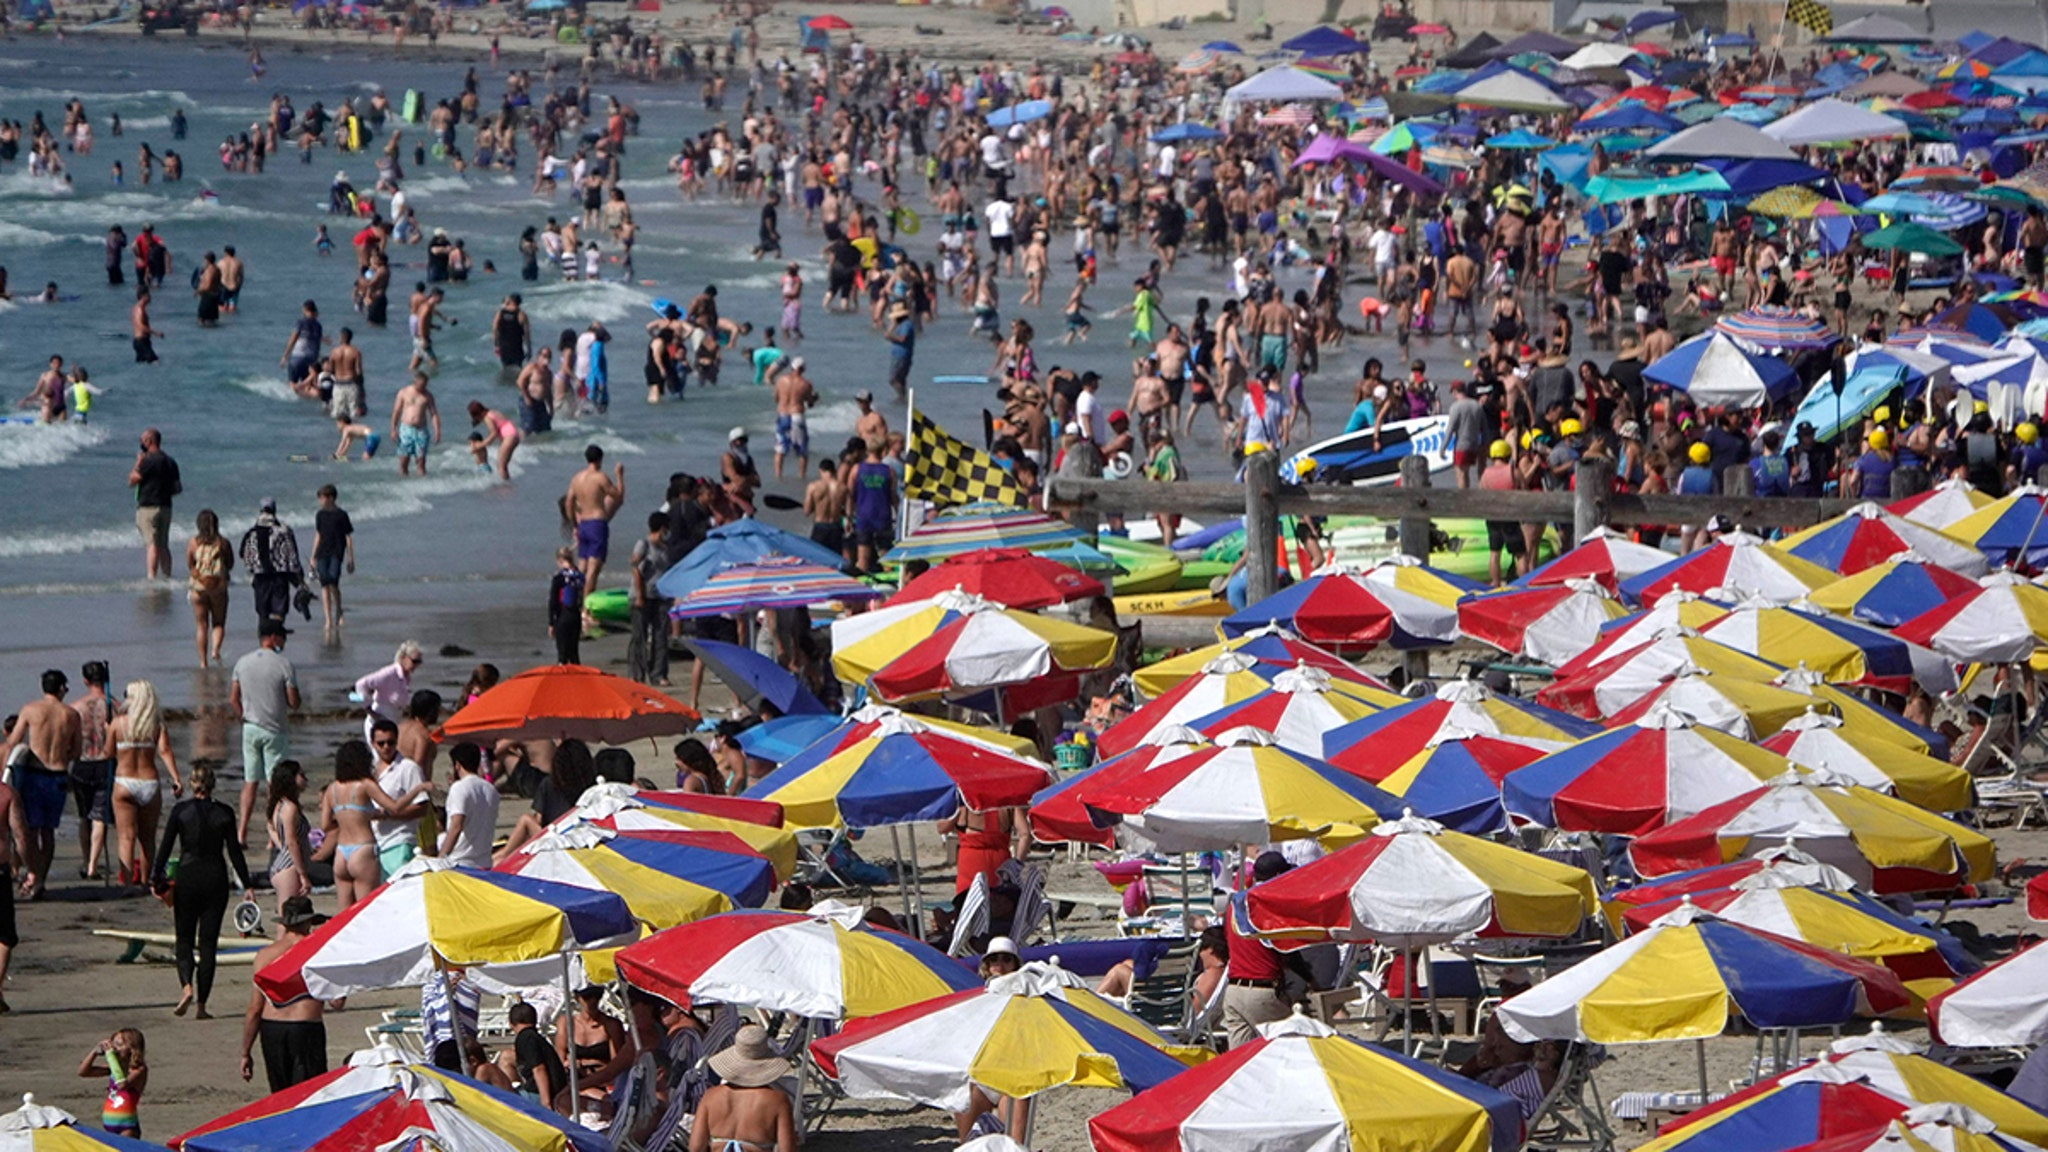 COVID-19 San Diego Beaches Packed to the Gills ... Corona Anyone???